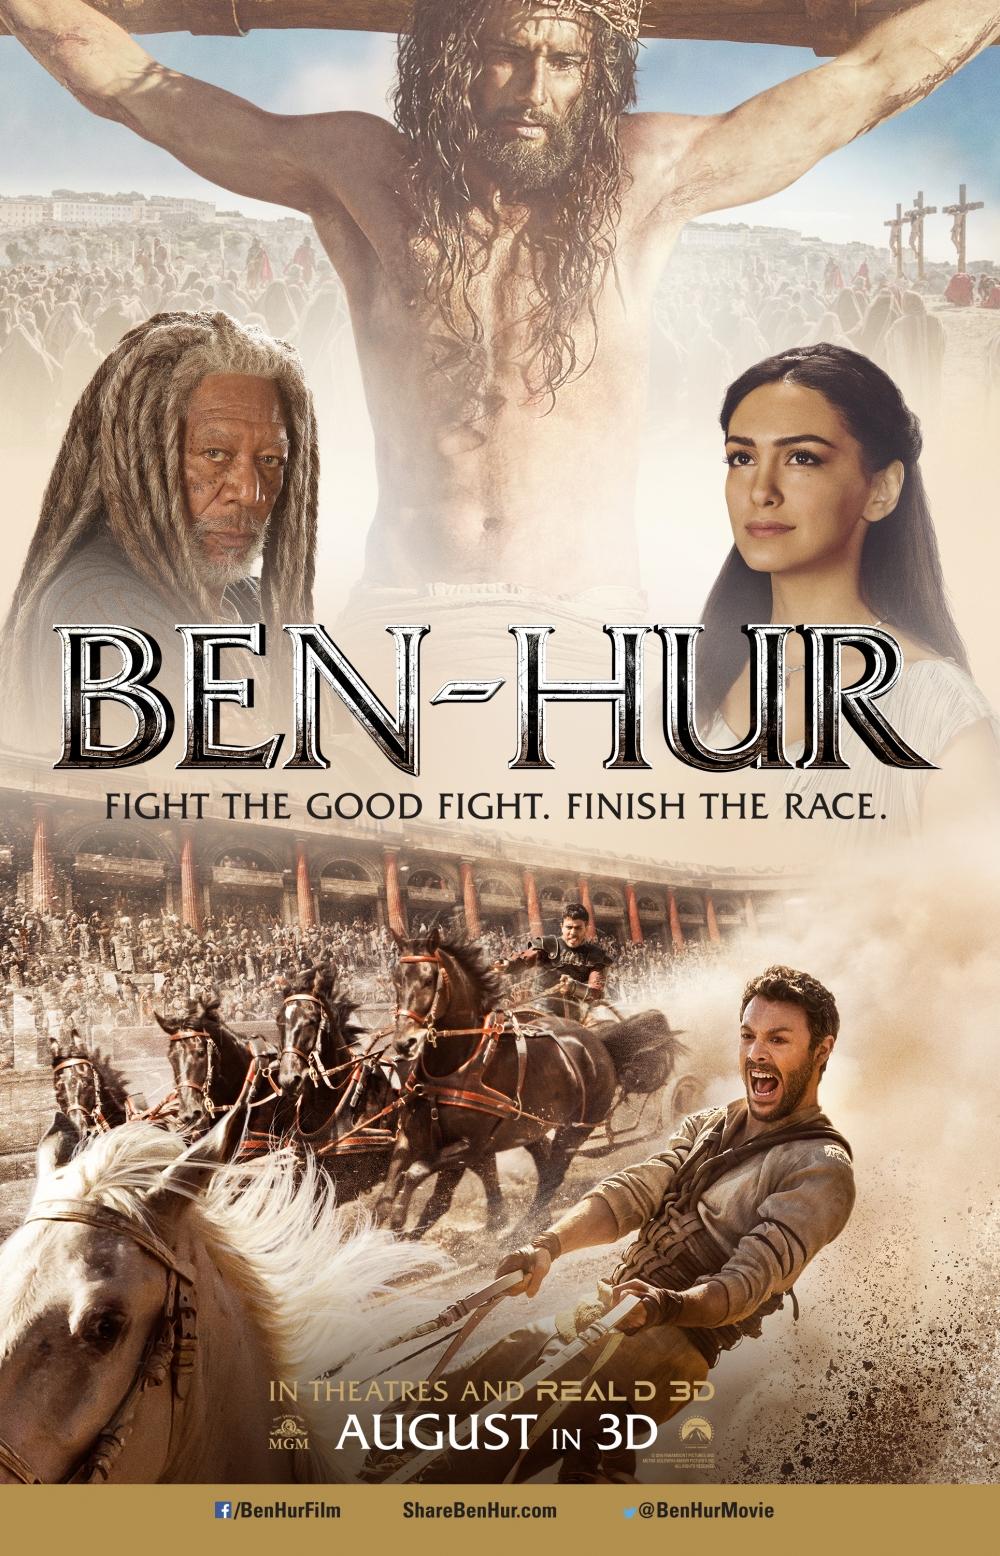 Ben-Hur release date - 26 February 2016 (USA), trailer